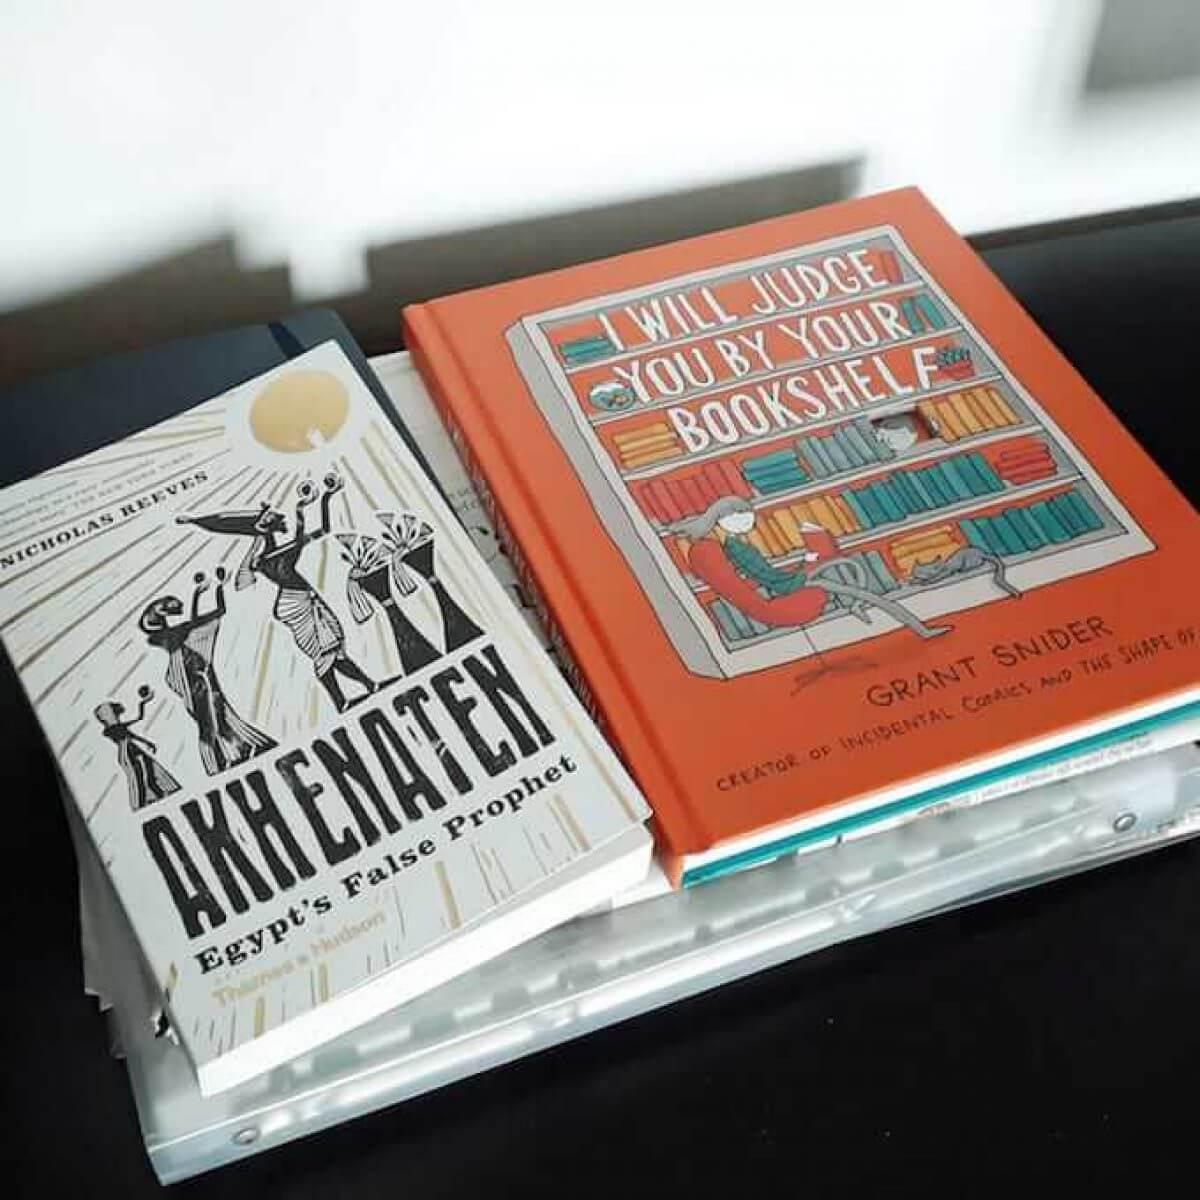 Nicholas Reeves, Akhenaten - Grant Snider, I will judge you by your bookshelf